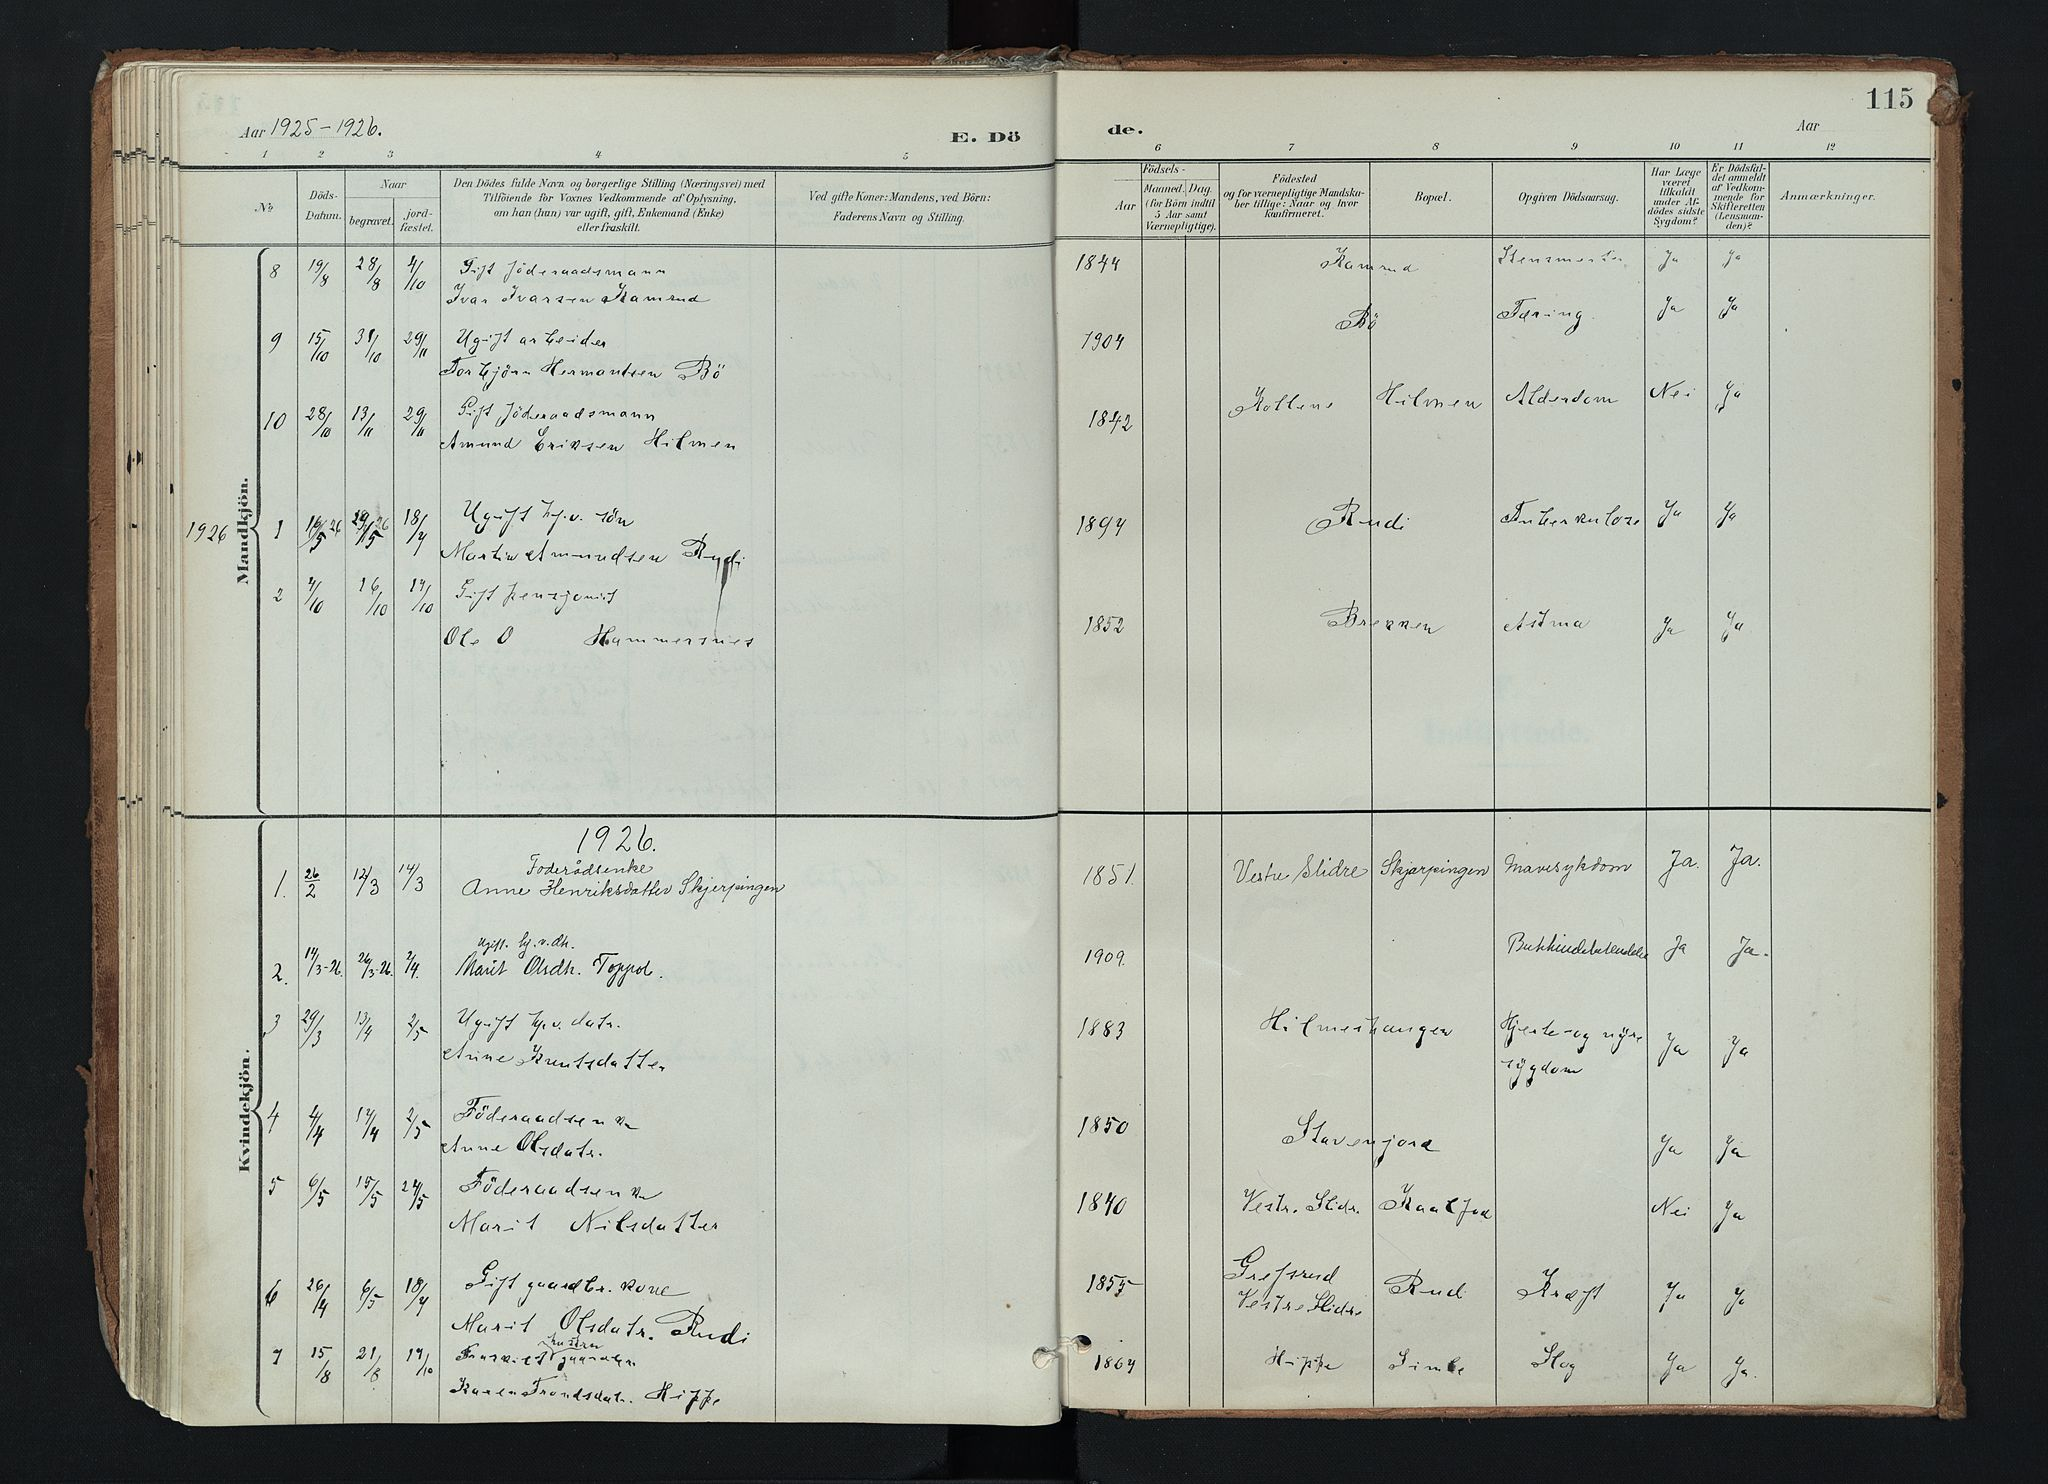 SAH, Nord-Aurdal prestekontor, Ministerialbok nr. 17, 1897-1926, s. 115